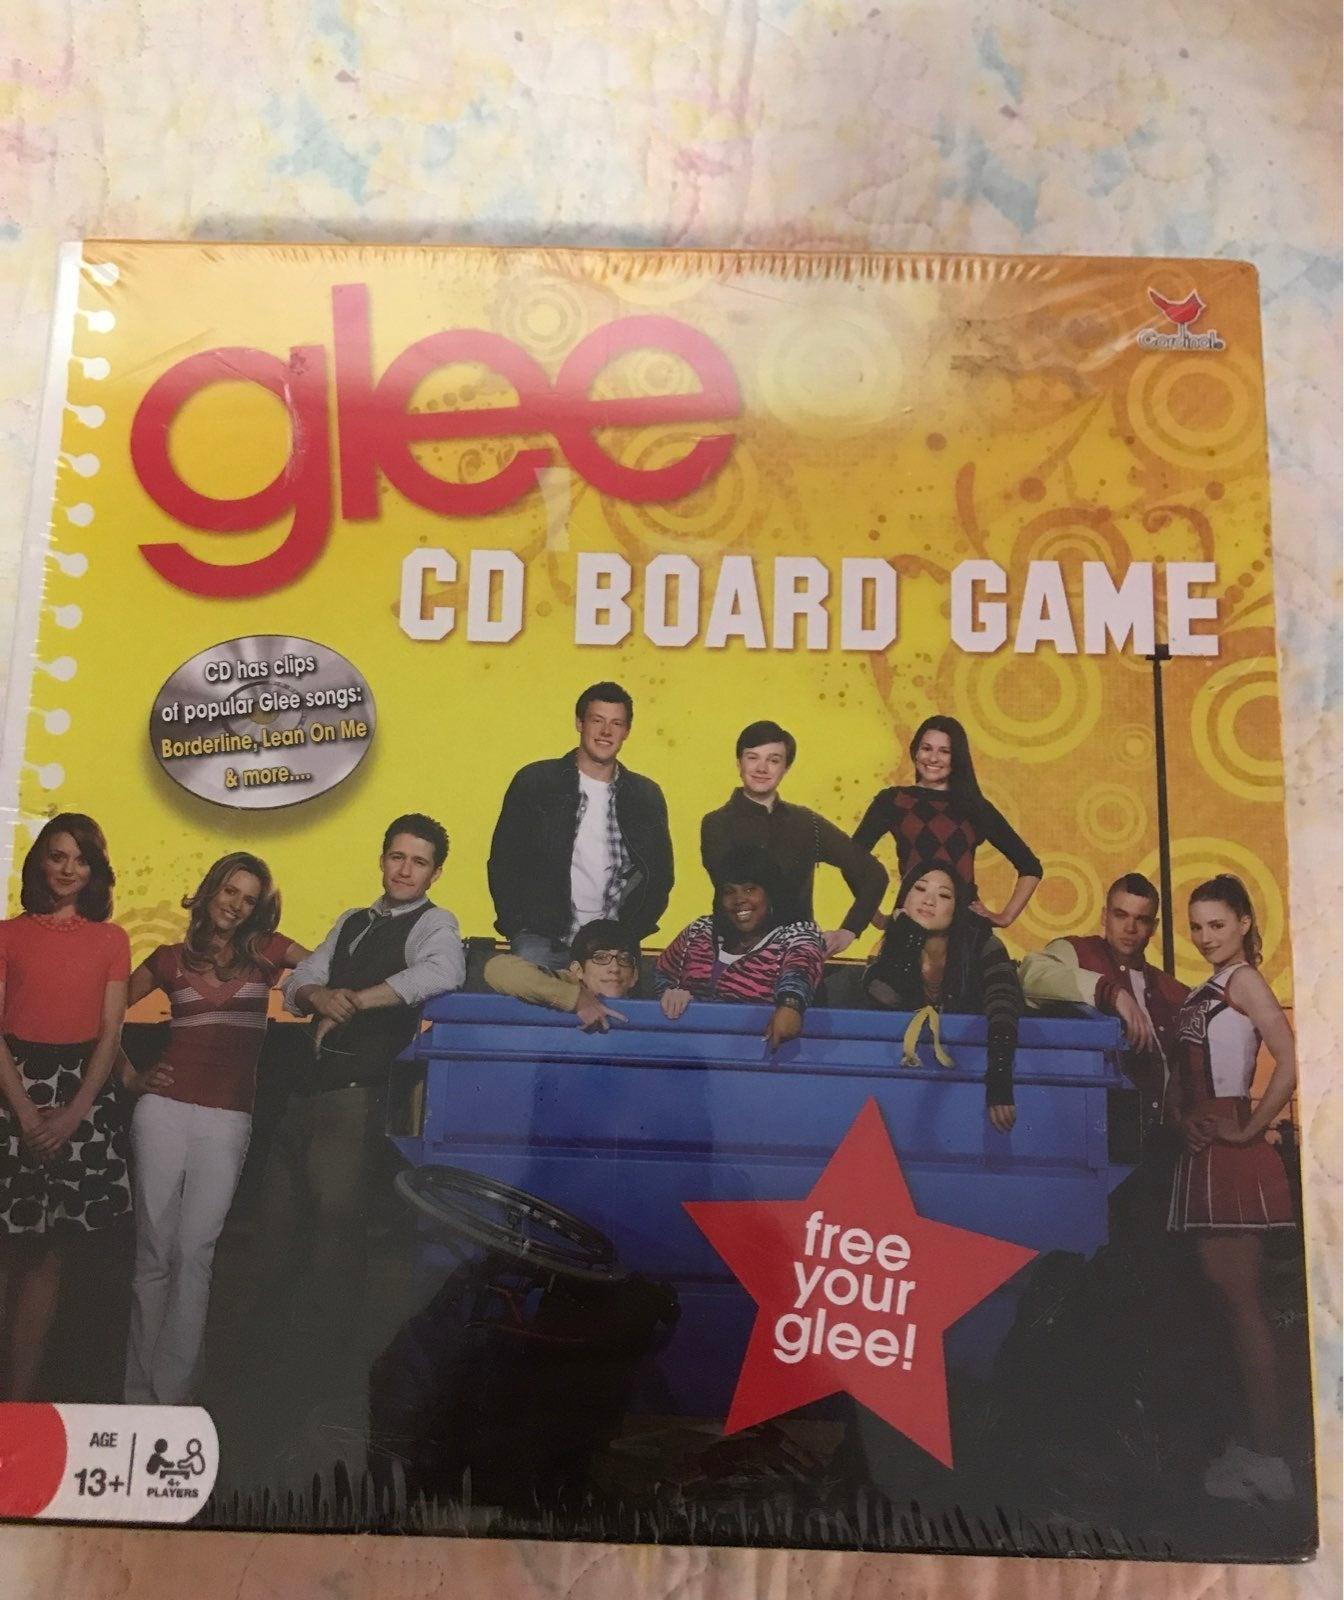 Glee CD Board Game